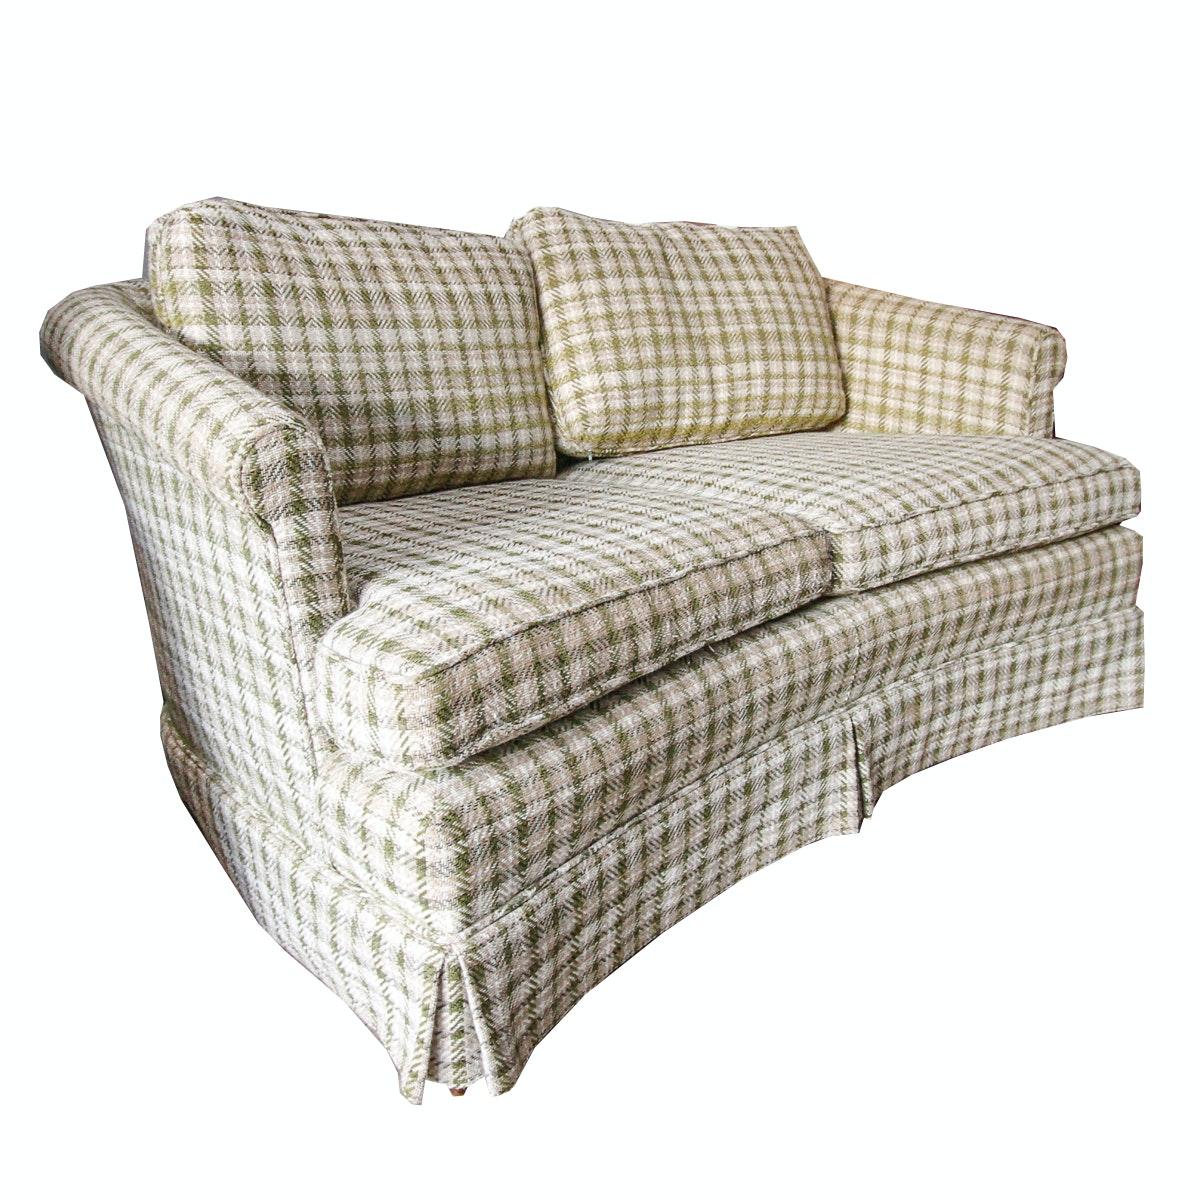 Vintage Wool Plaid Sofa By Shaw Furniture ...